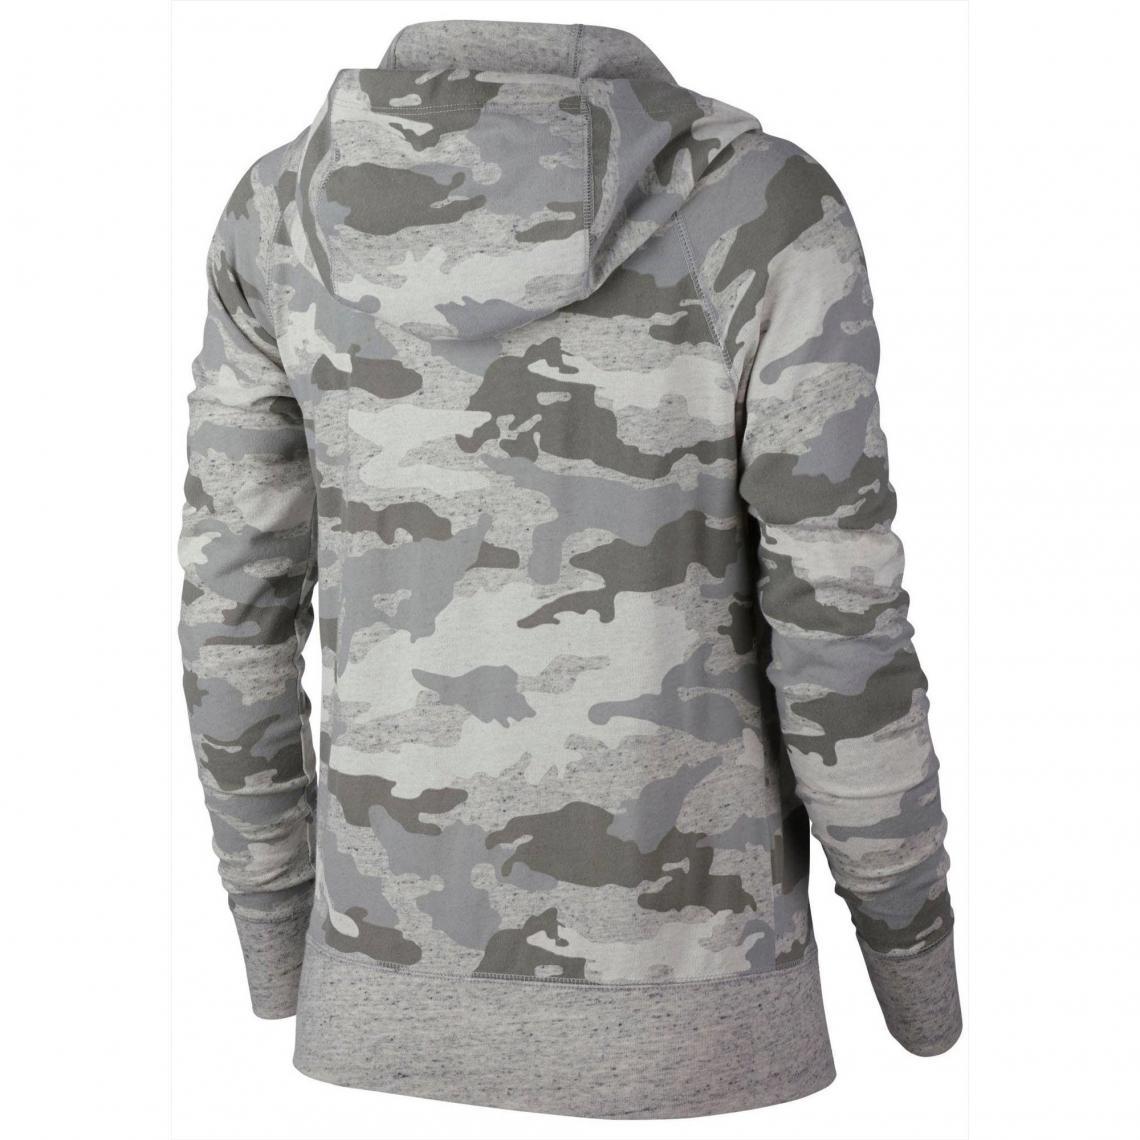 À Sweat Nike Zippé Femme Camouflage3suisses Capuche MVGpqzSU